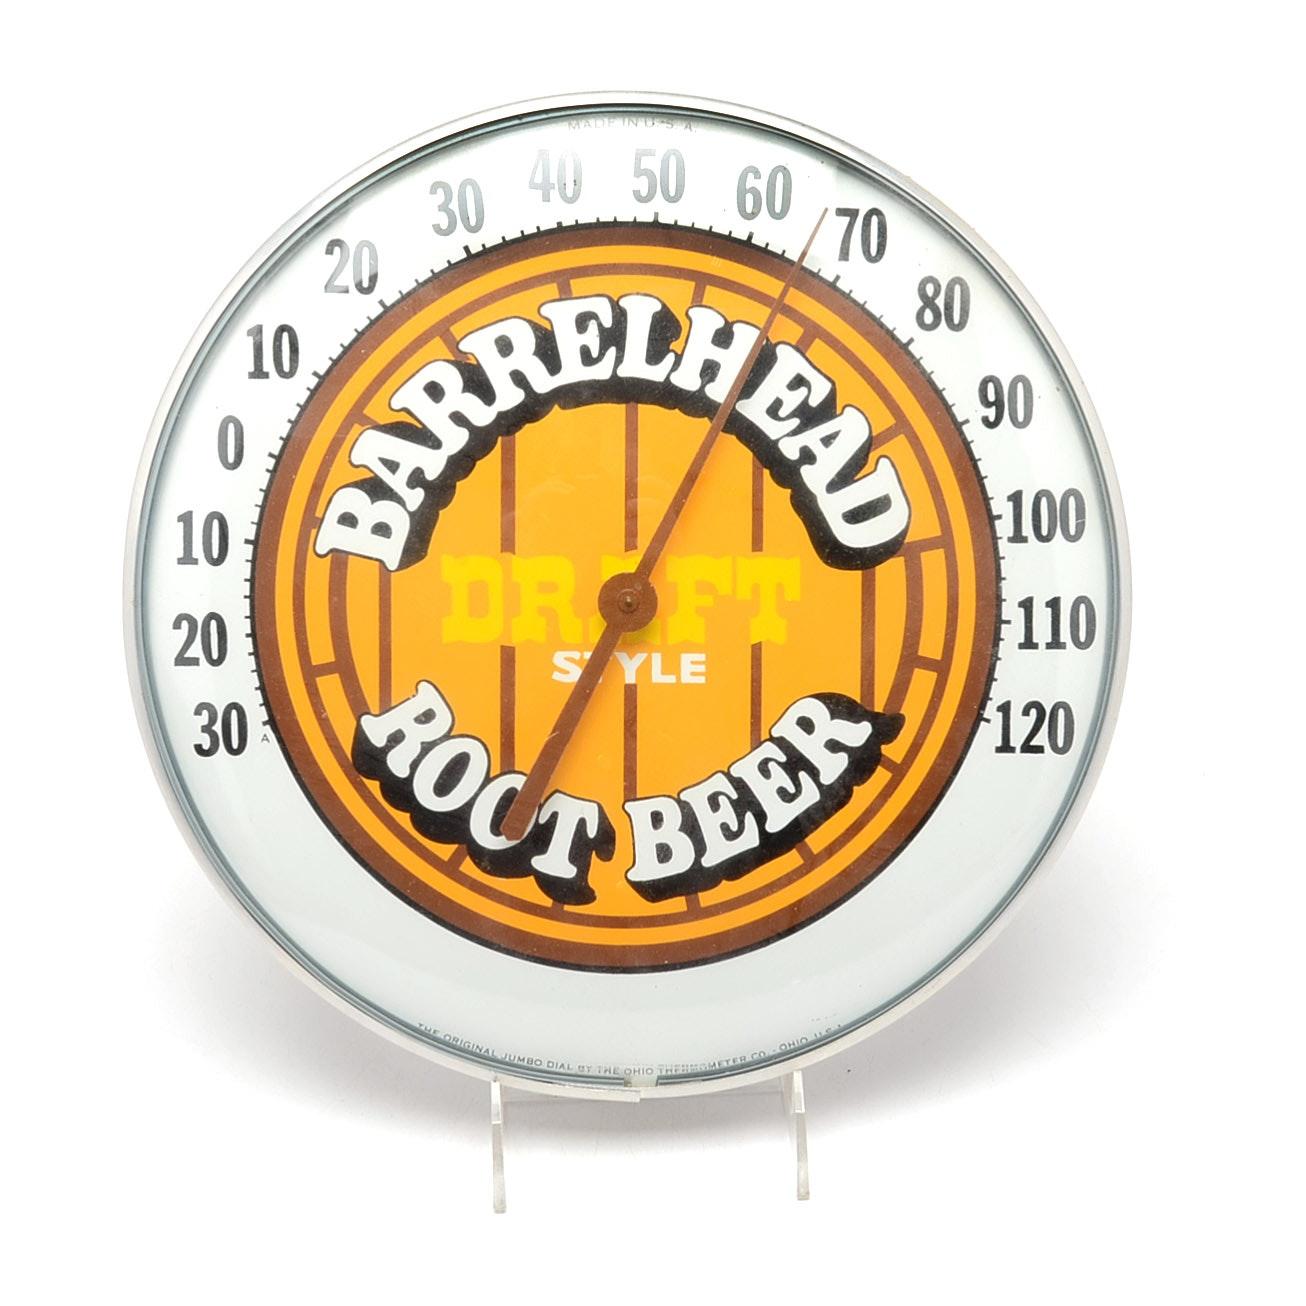 1970s Barrelhead Rootbeer Thermometer